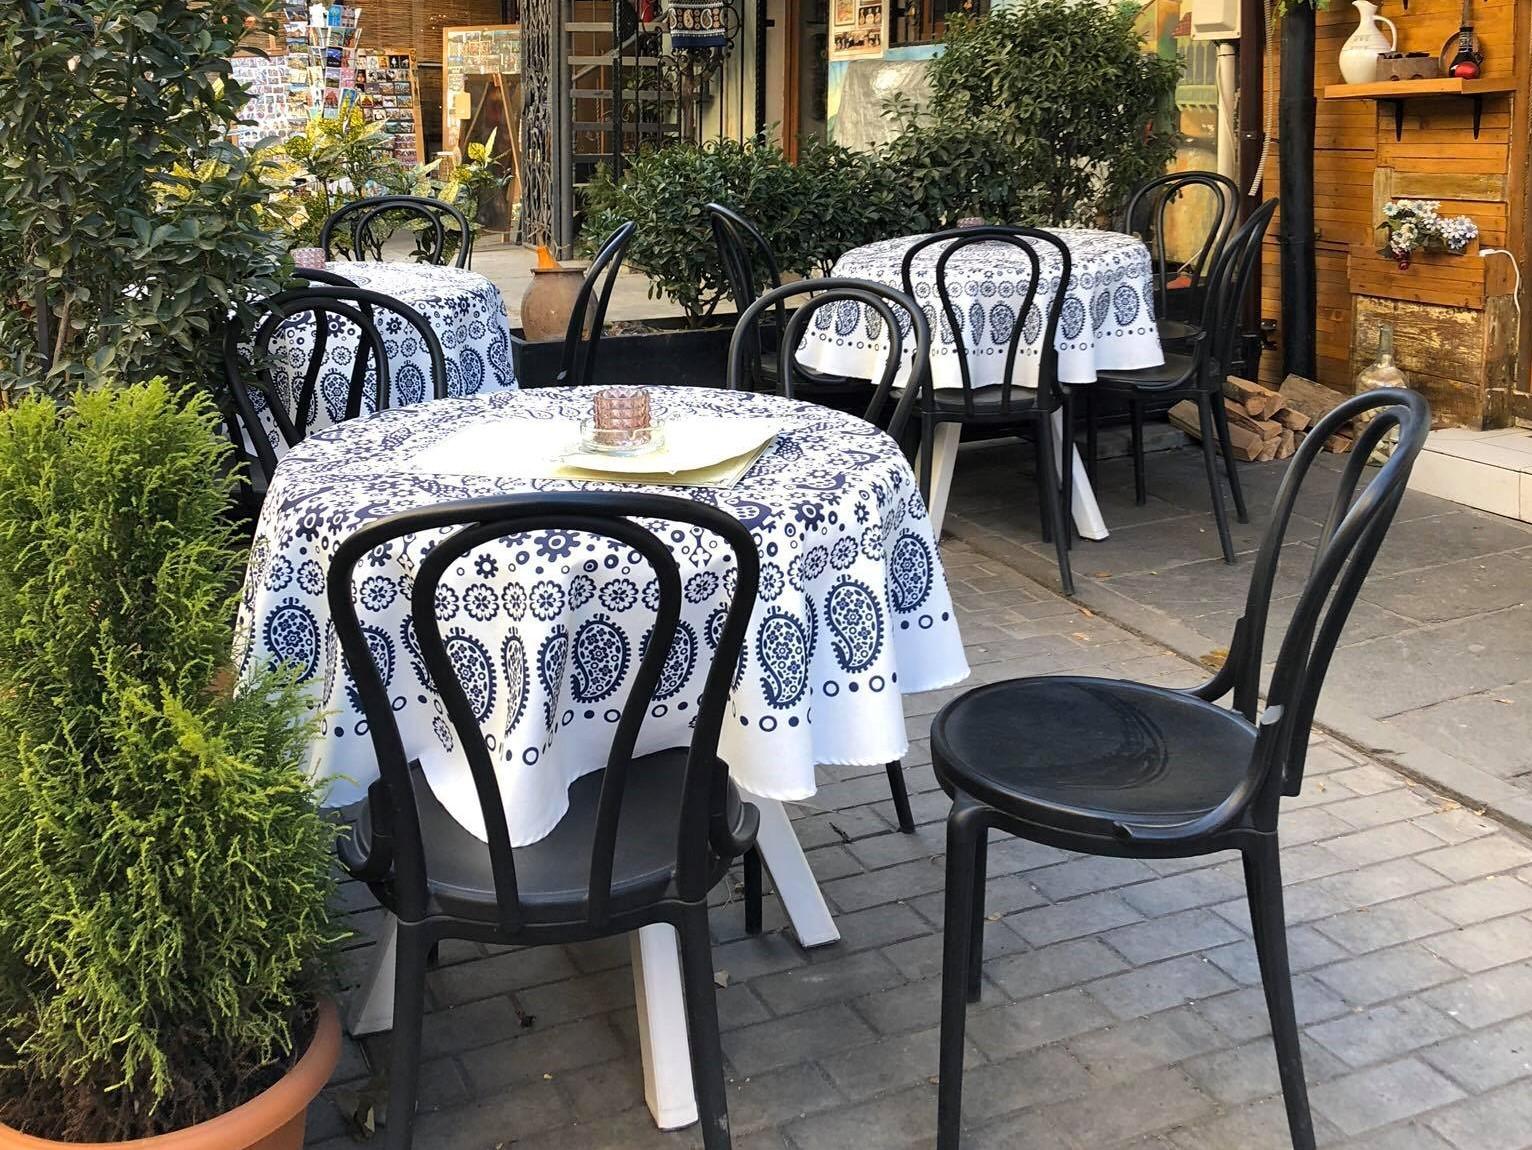 Restaurant #новости Covid-19, пандемия коронавируса